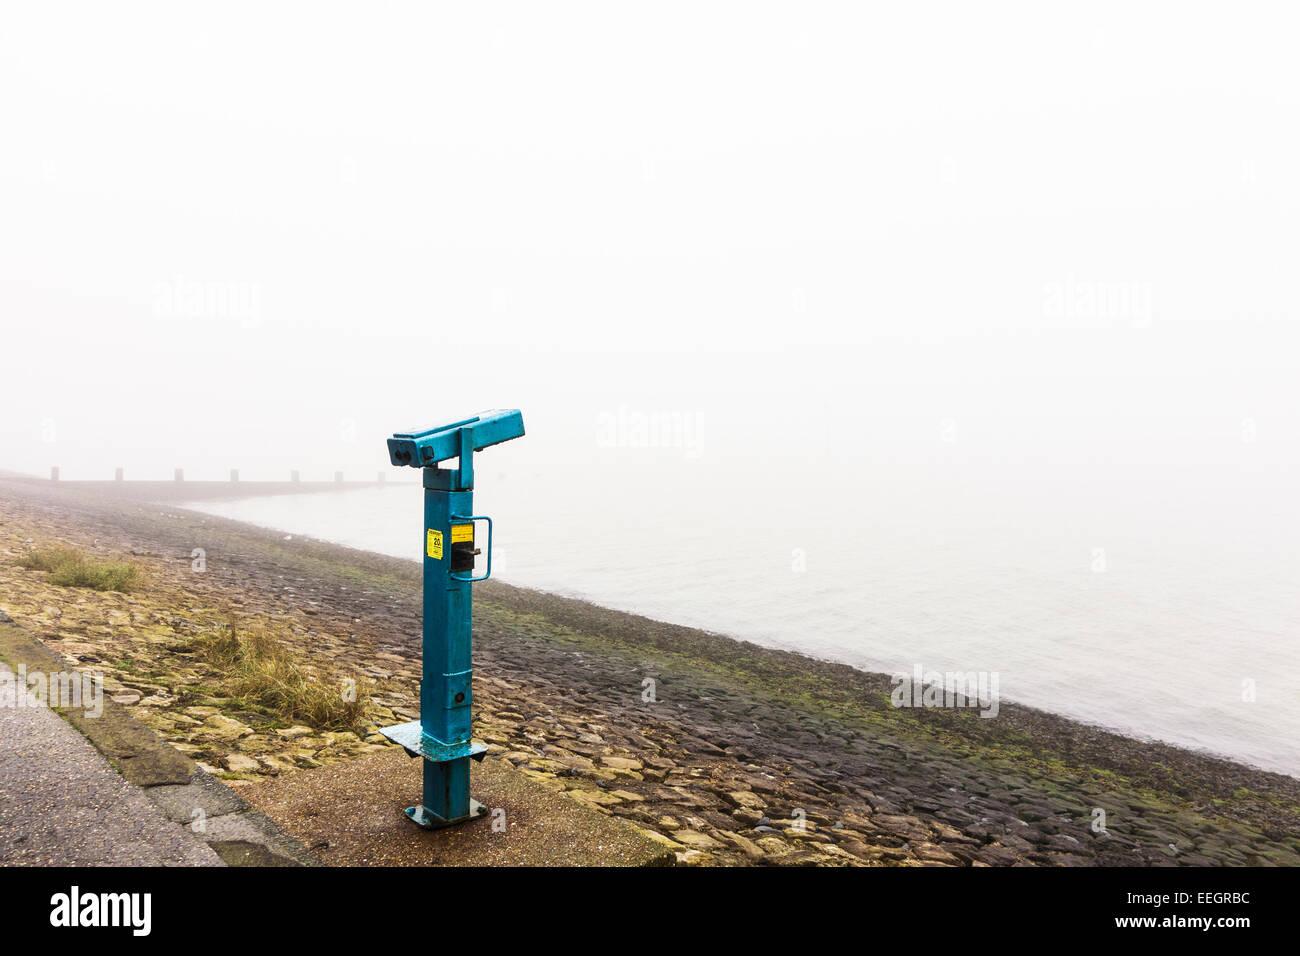 Seaside viewpoint binoculars. - Stock Image